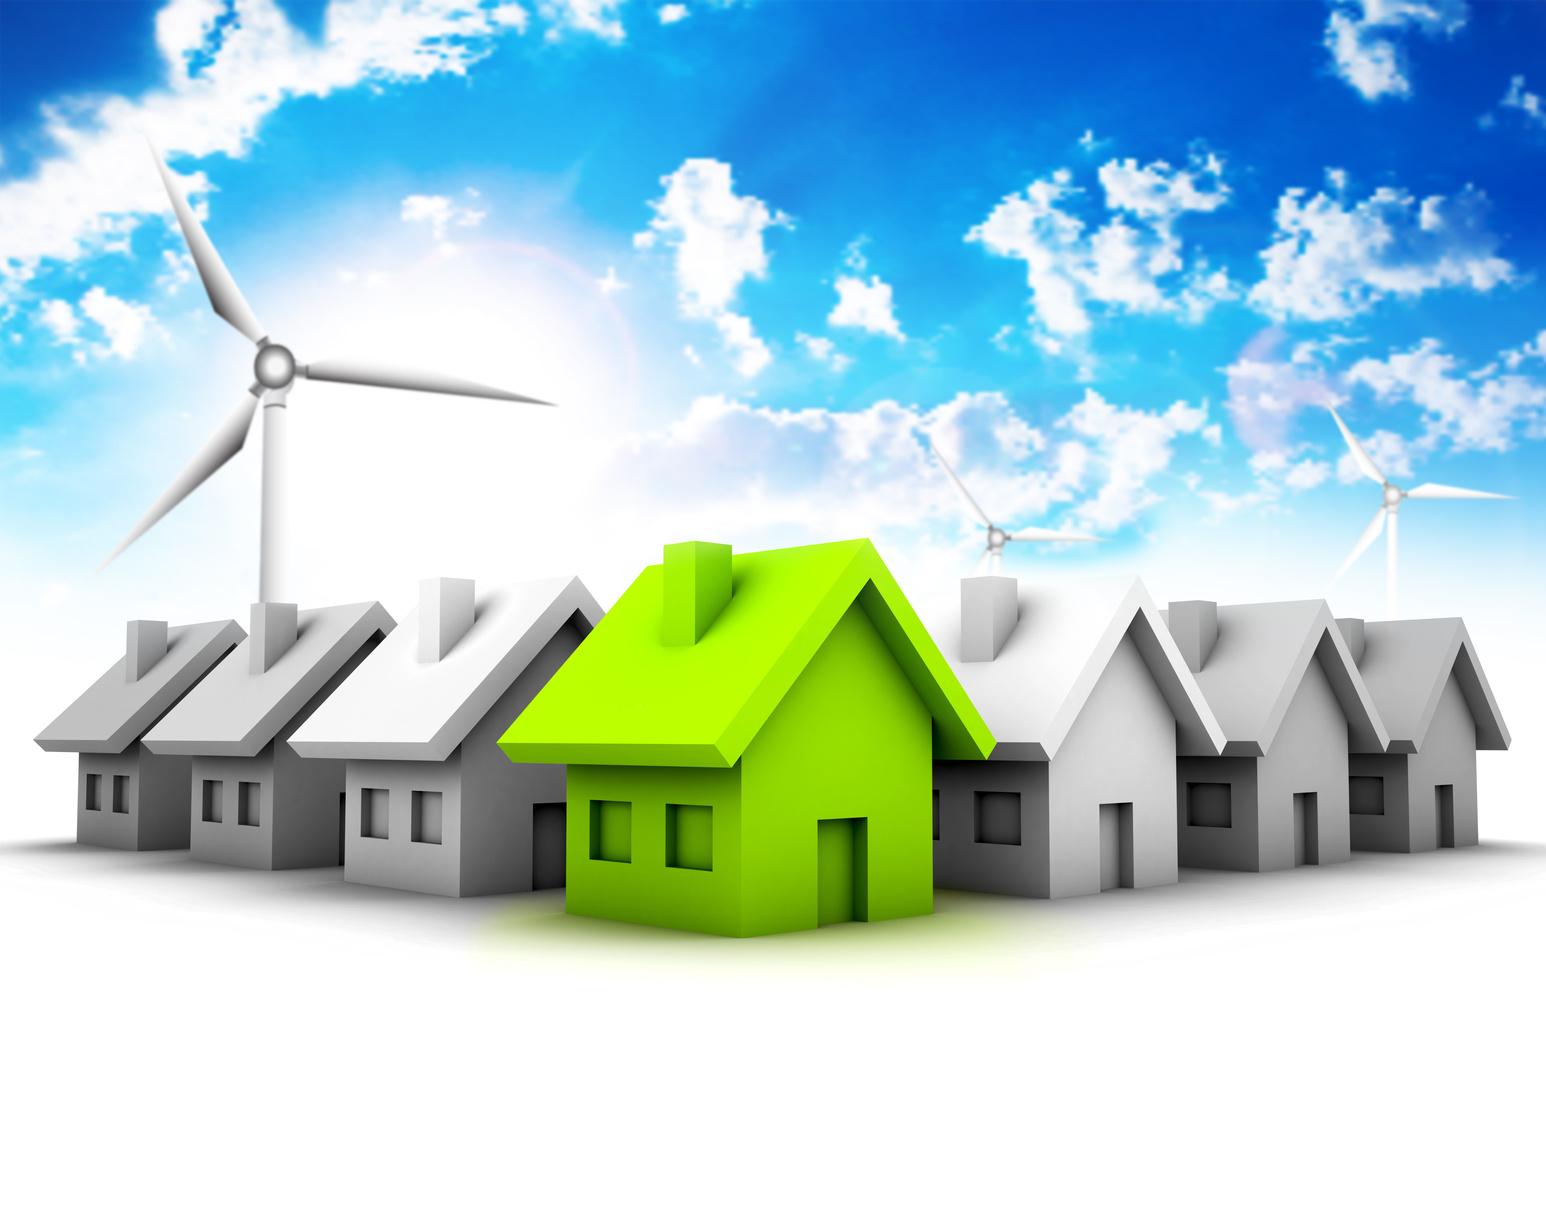 Installer éolienne toit maison